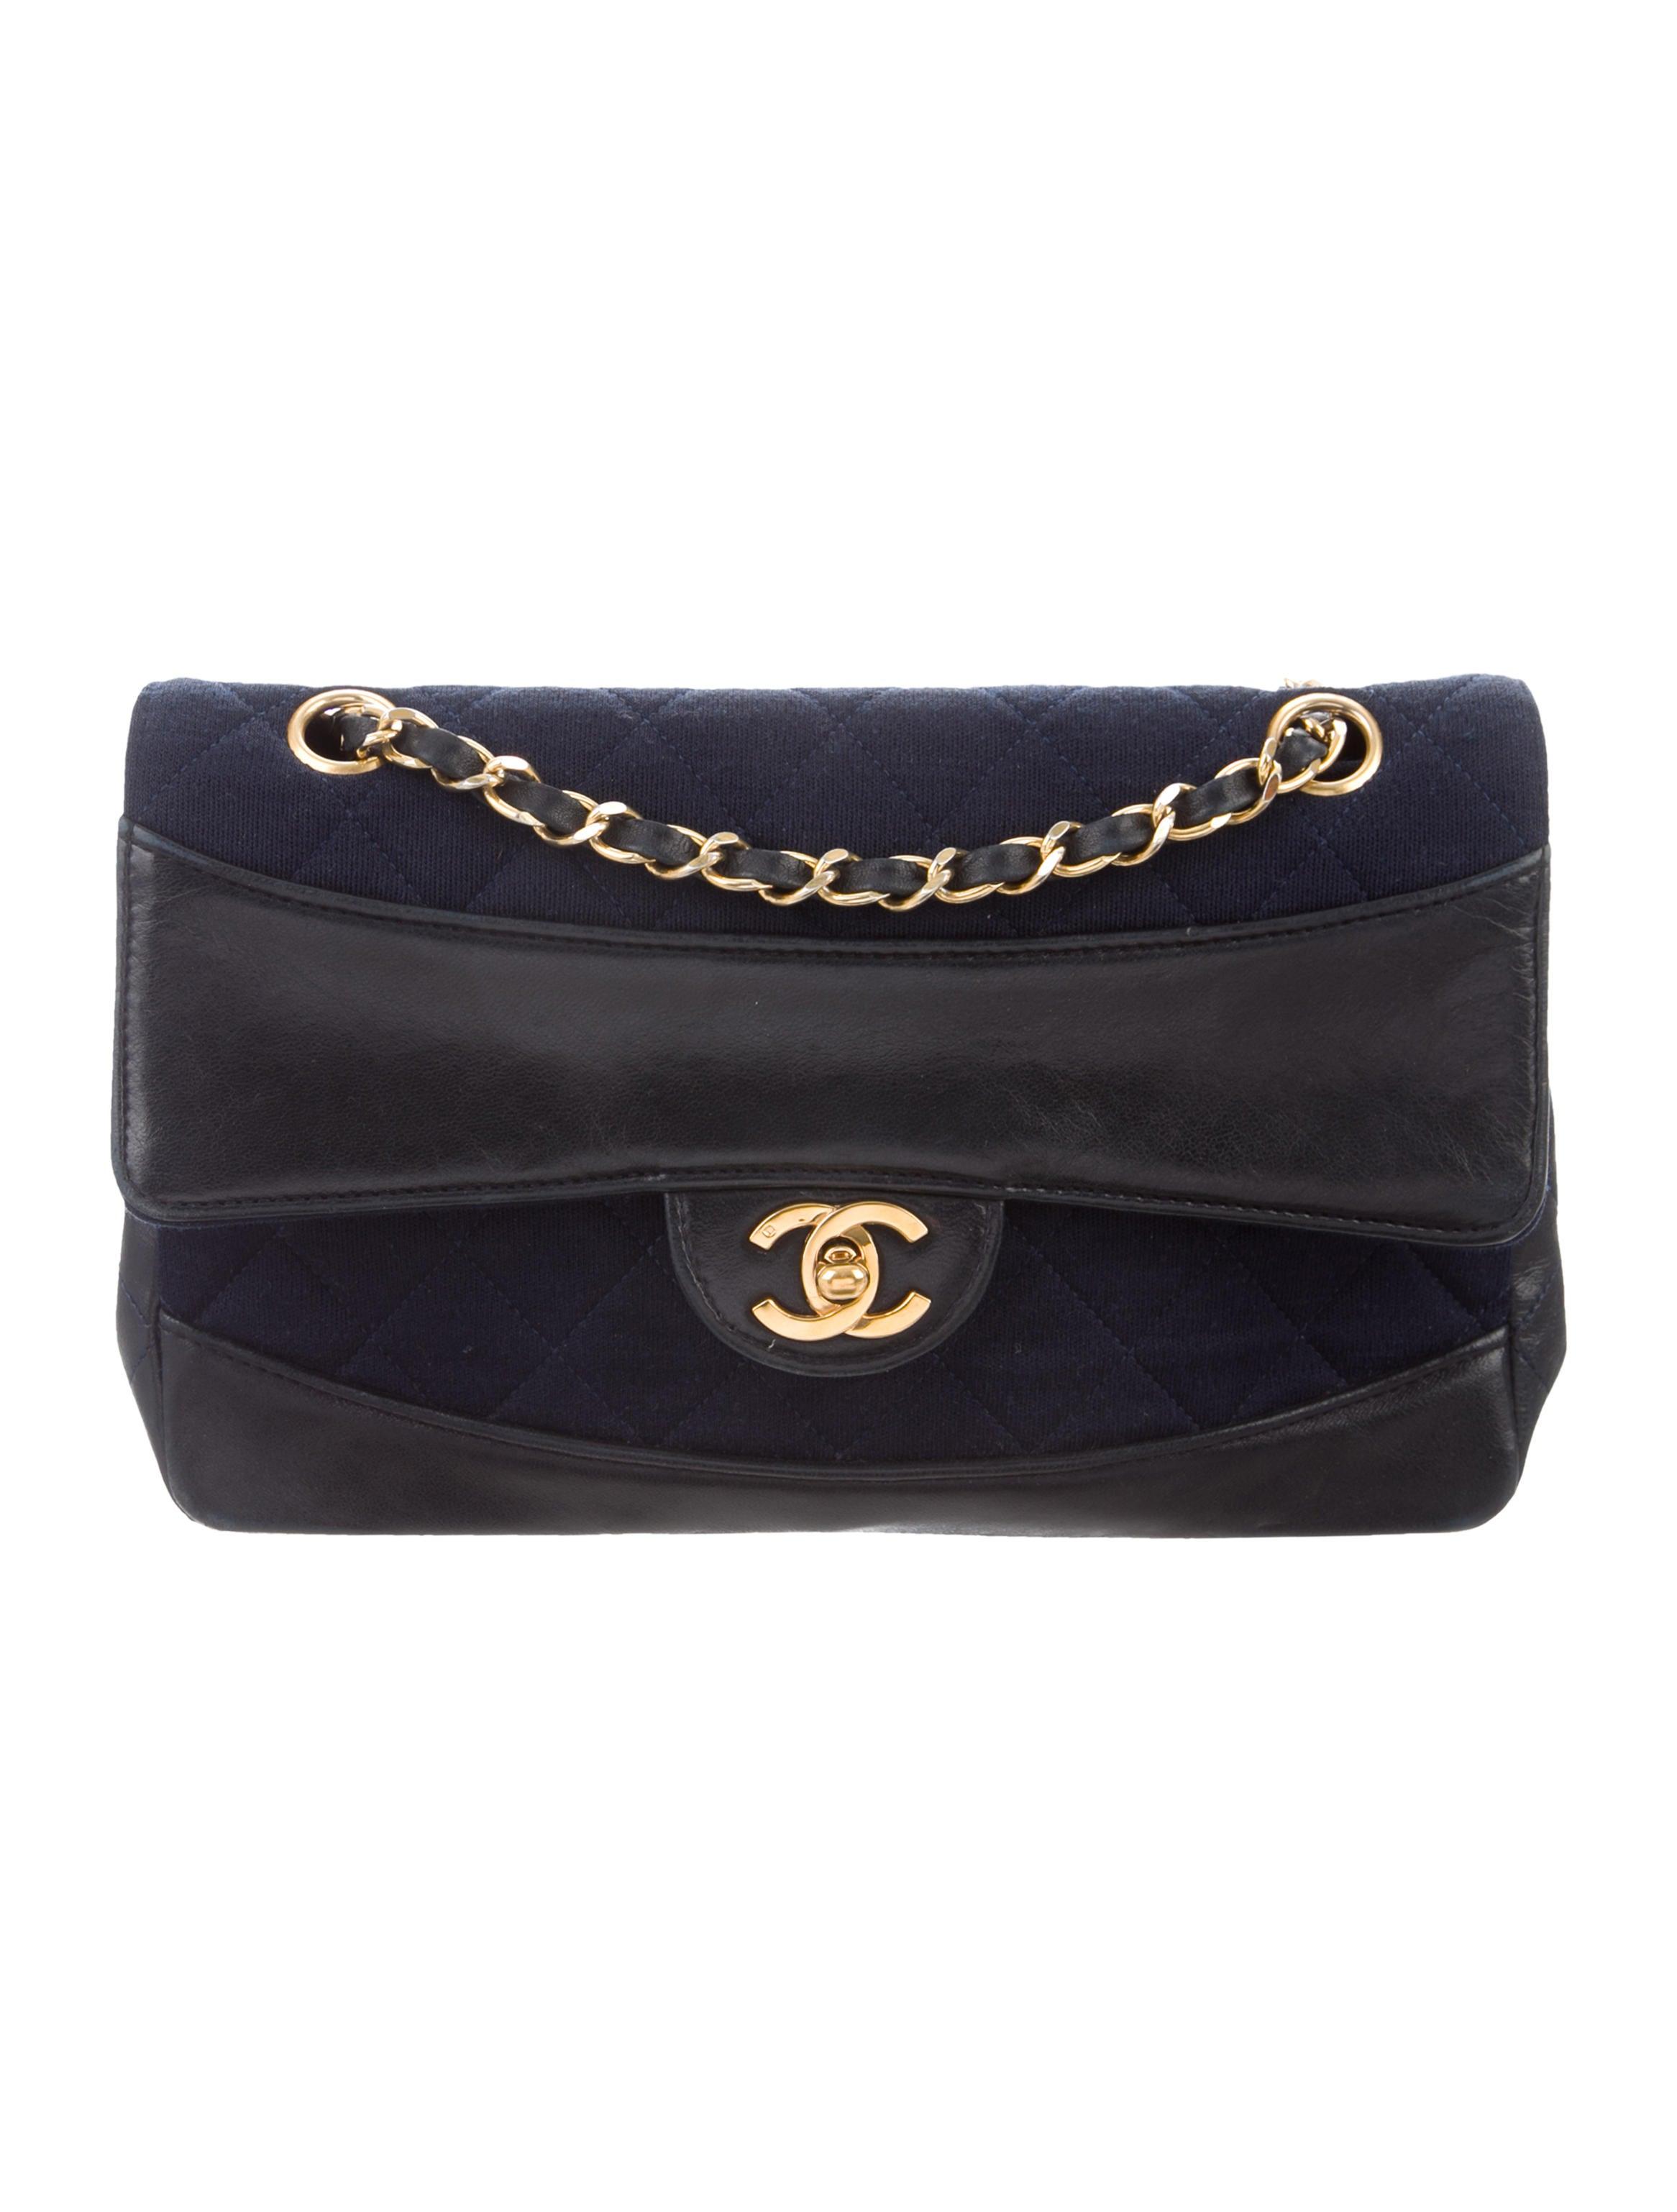 402382e3a4b8 Chanel Jersey and Leather Single Flap Bag - Handbags - CHA332661 ...